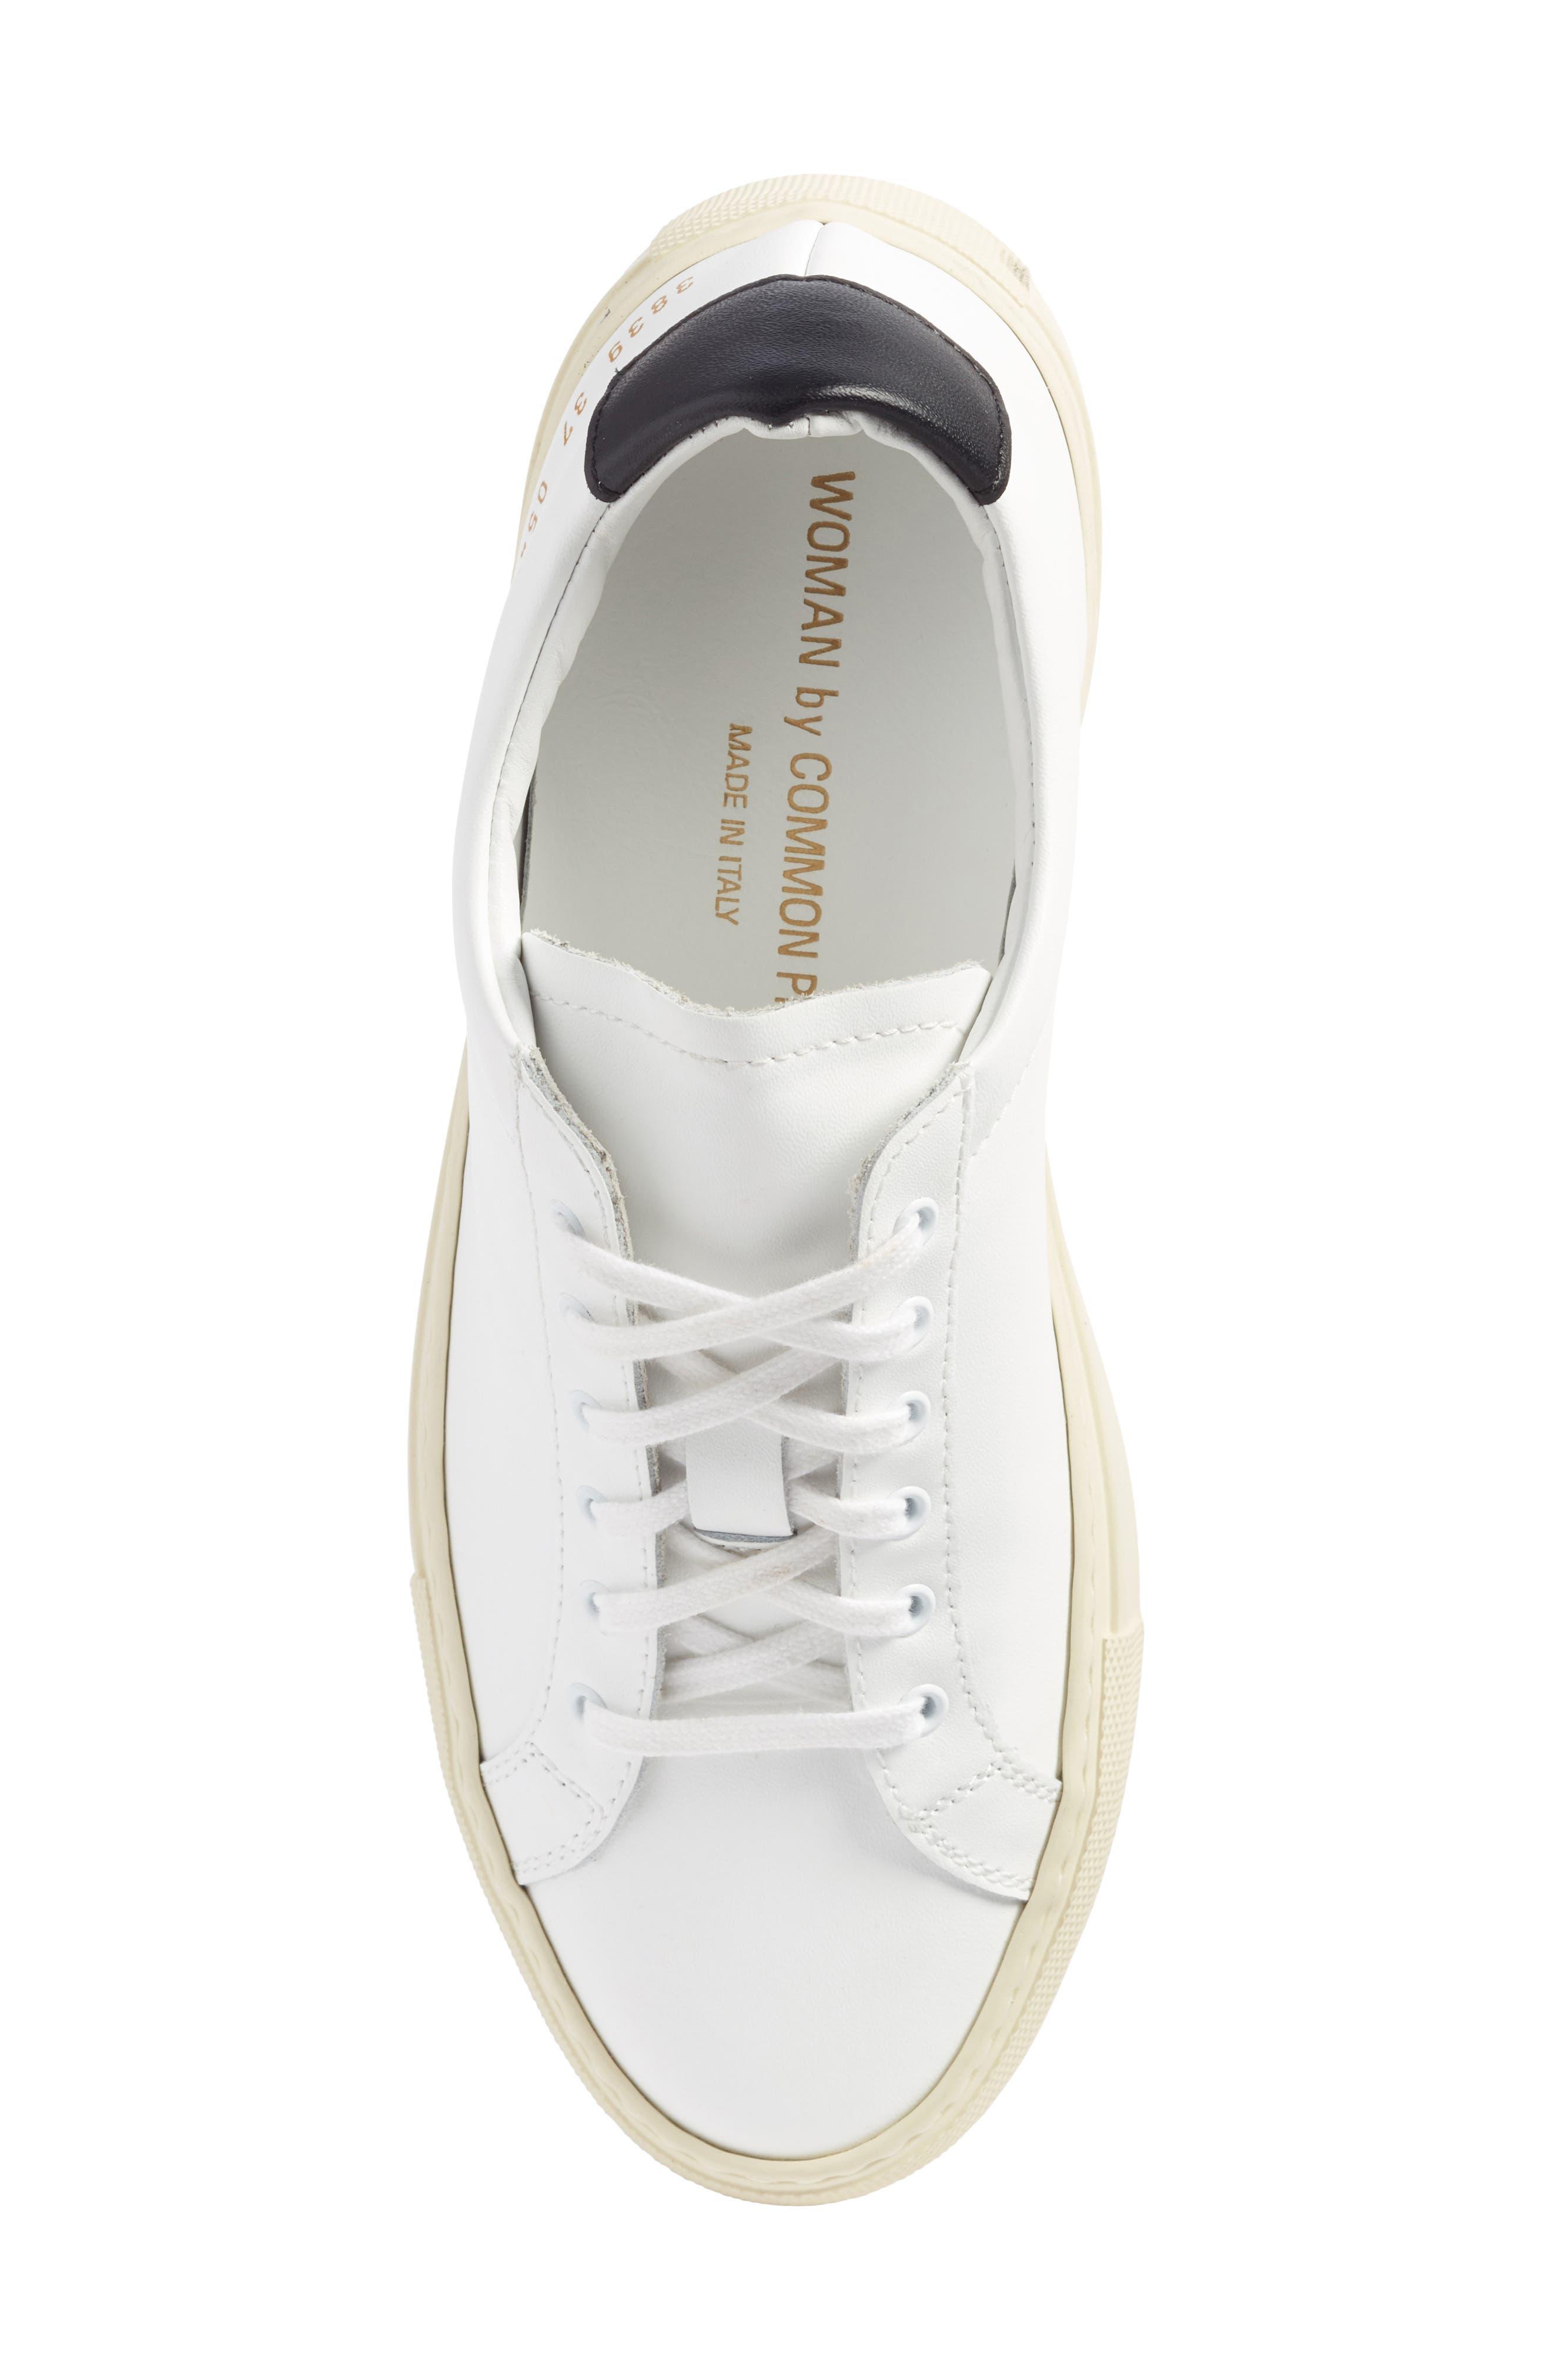 Achilles Low Top Sneaker,                             Alternate thumbnail 5, color,                             White/ Black